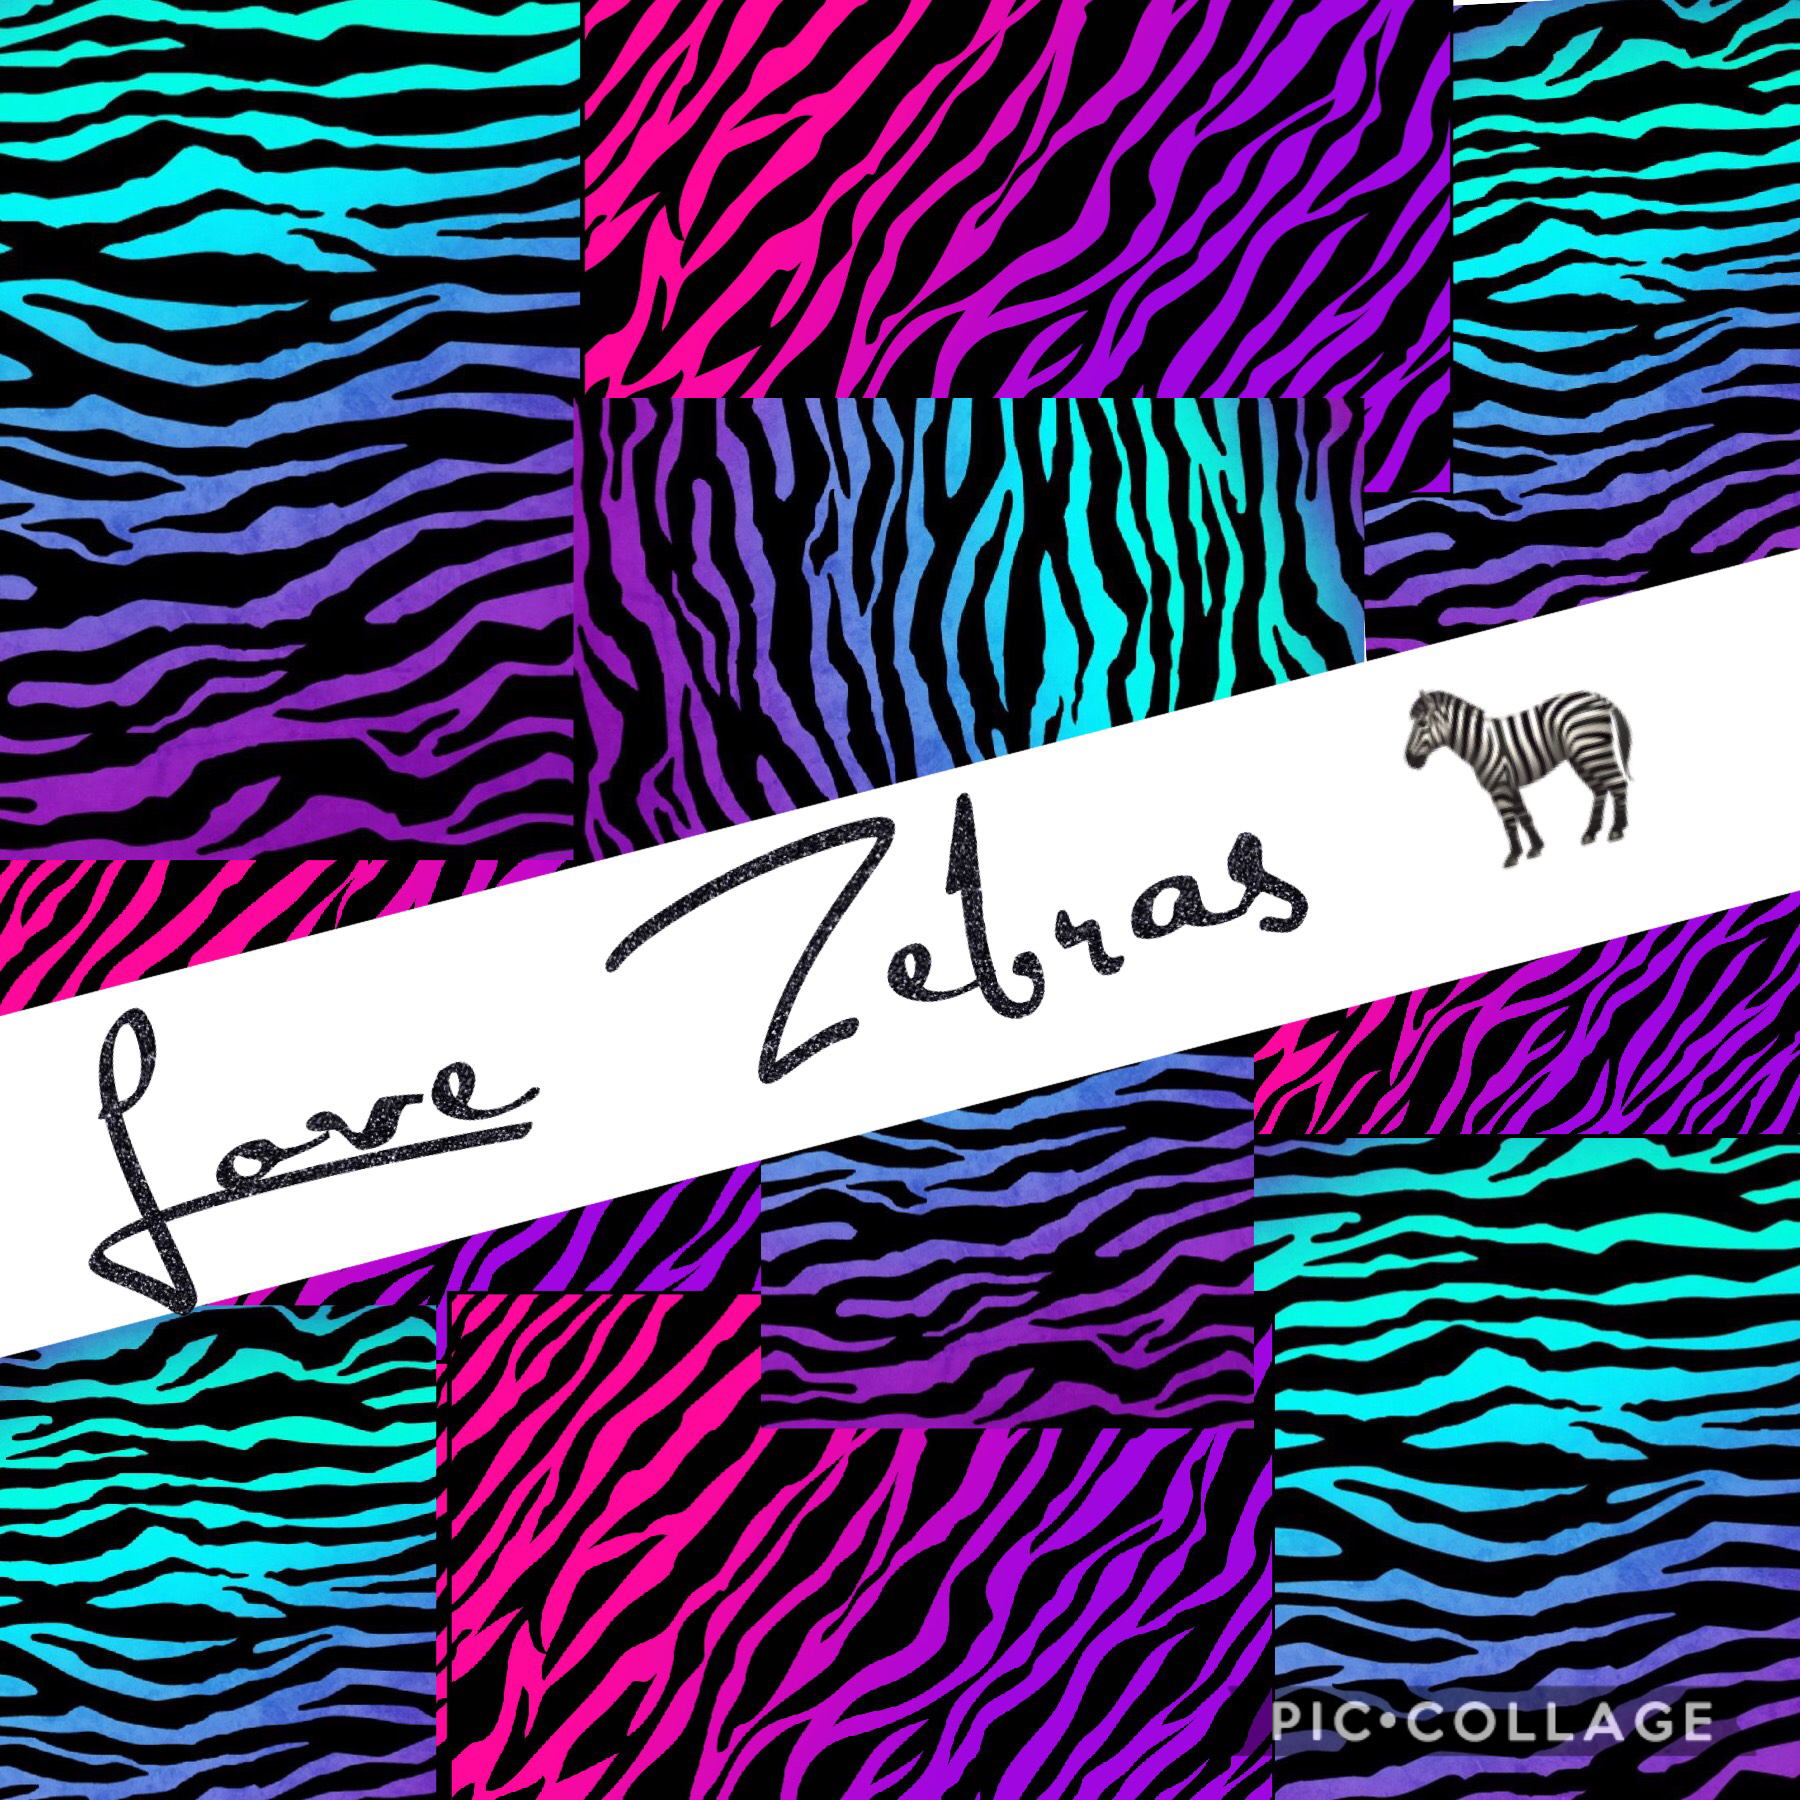 Inspired by Zebras 🦓